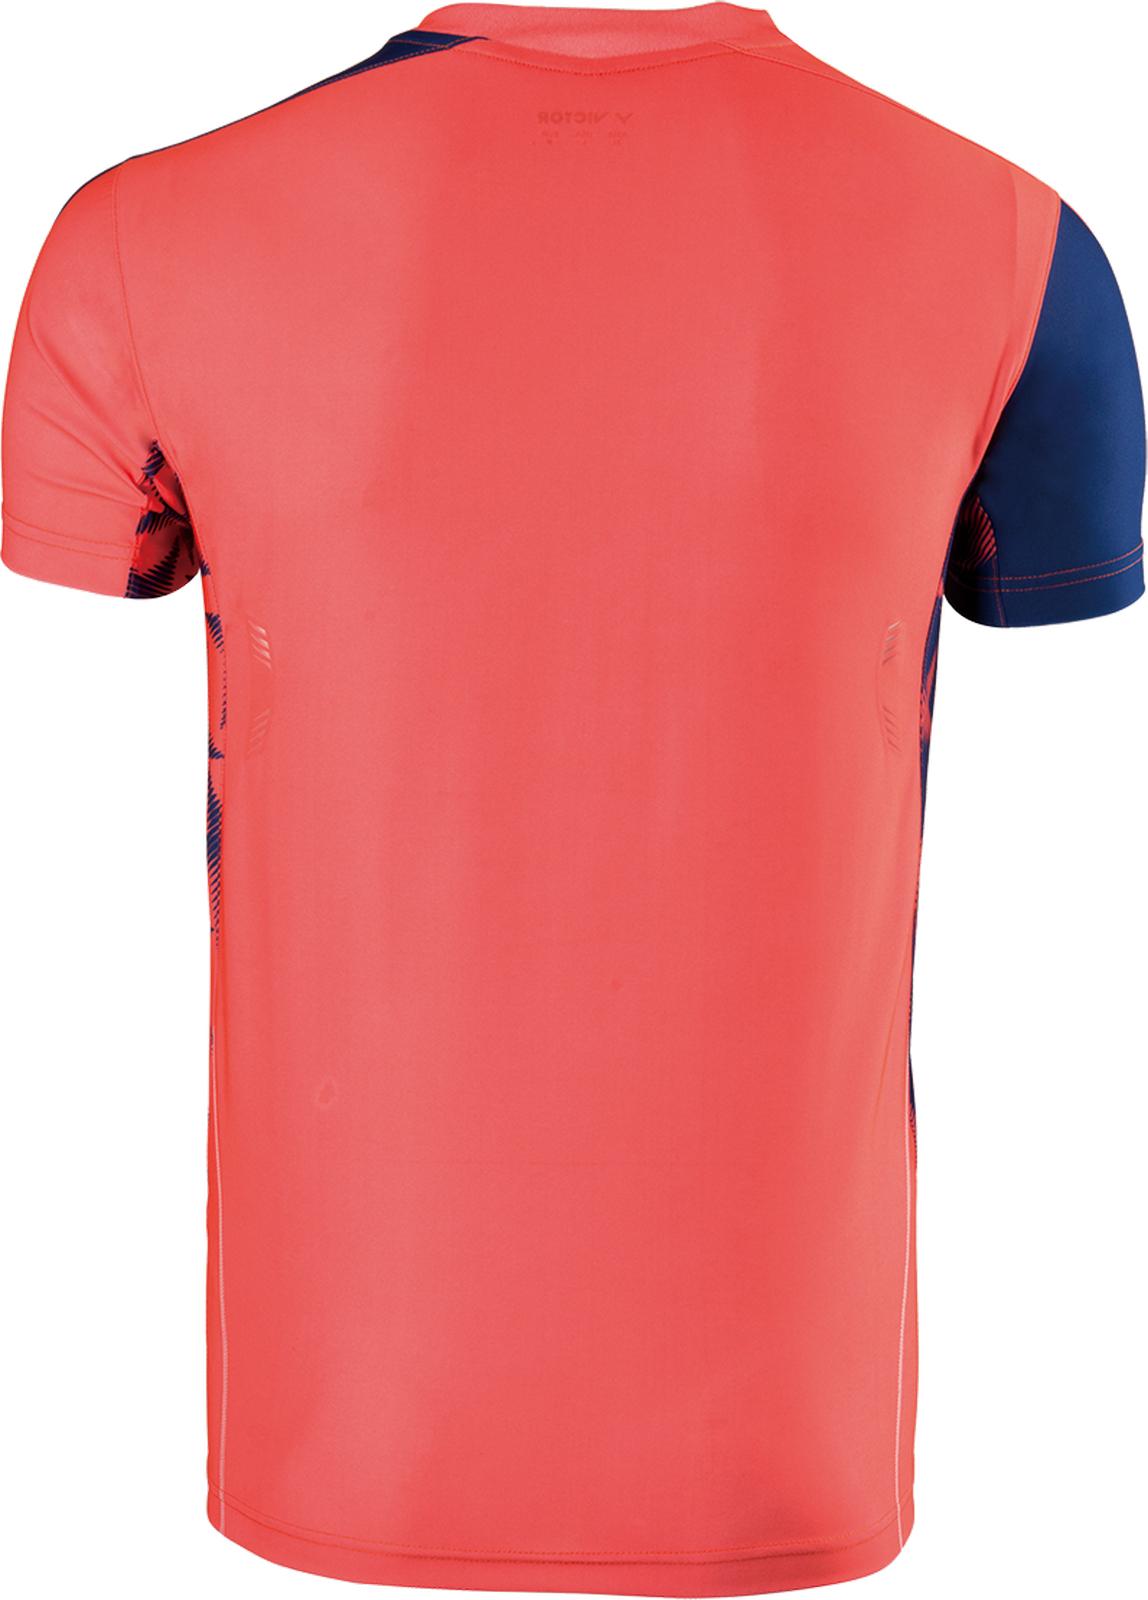 Victor Shirt Malaysia unisex blau